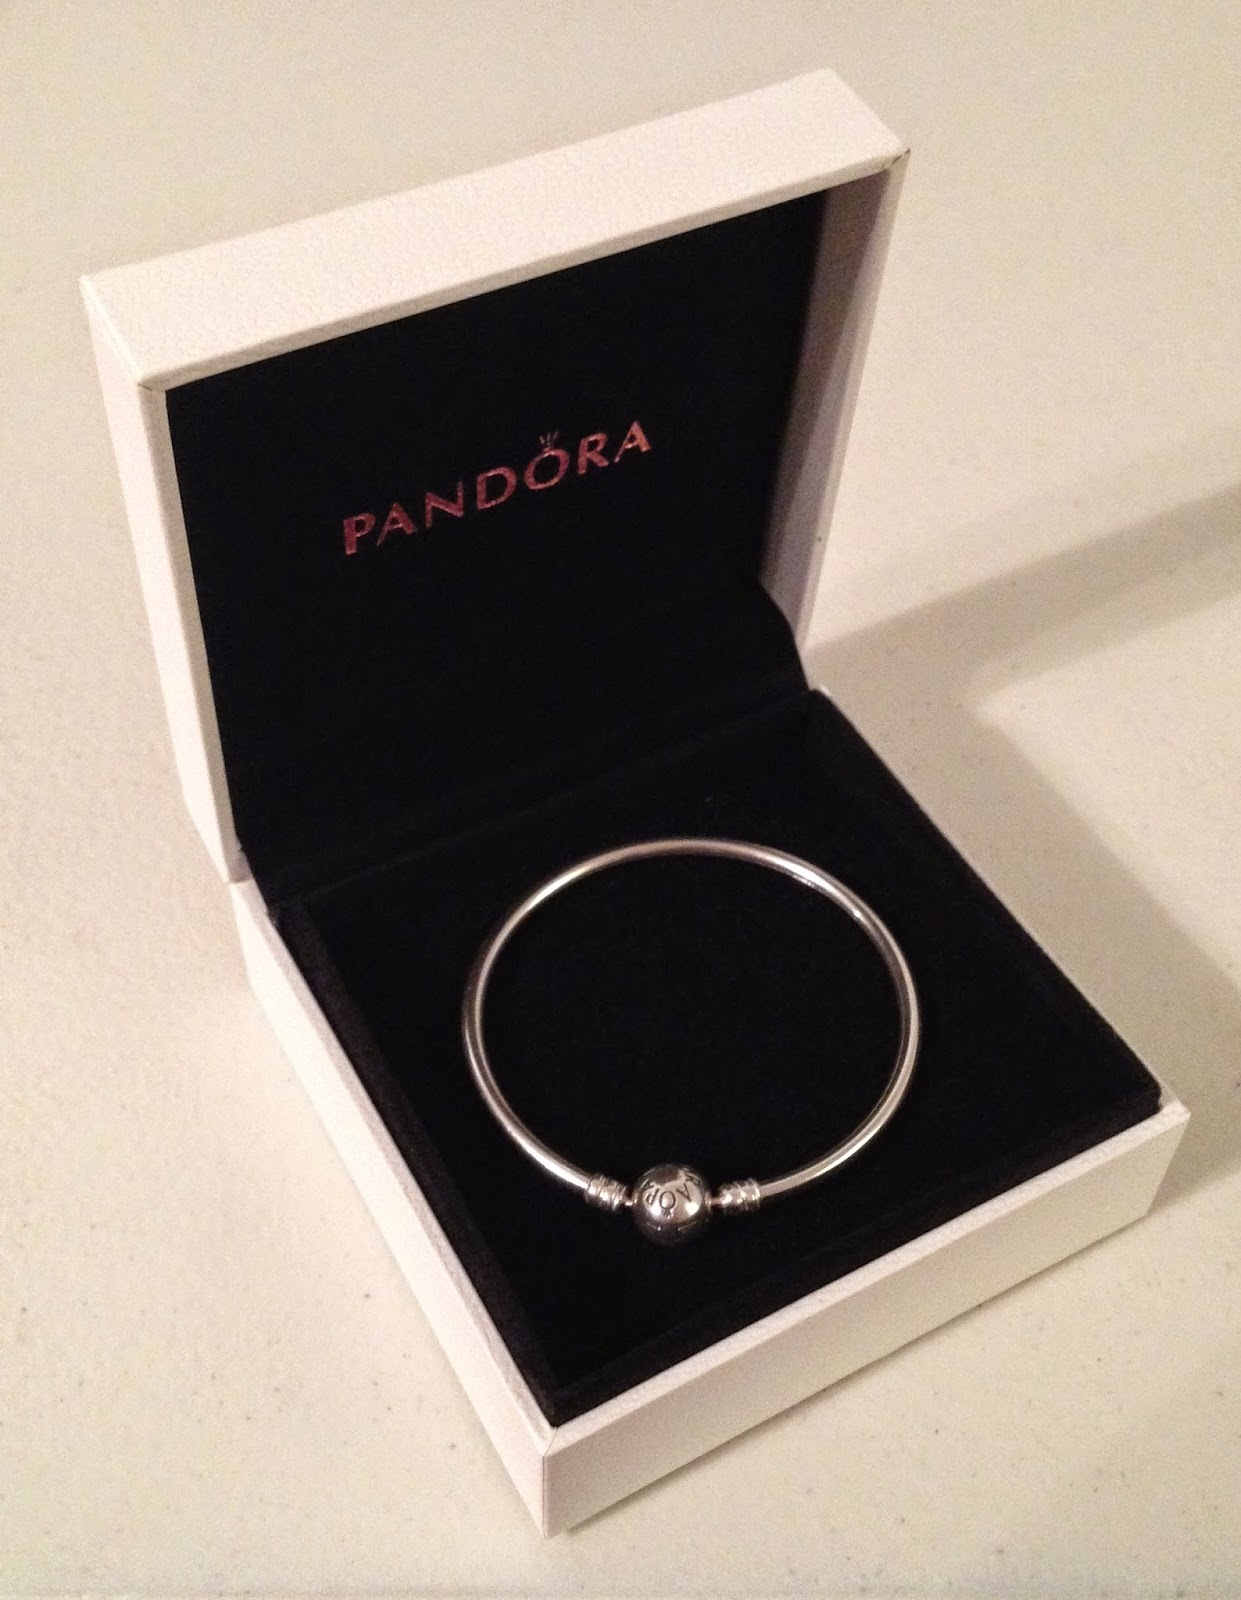 shipsfromus: PRE-ORDER: PANDORA 2015 Valentine's Collection